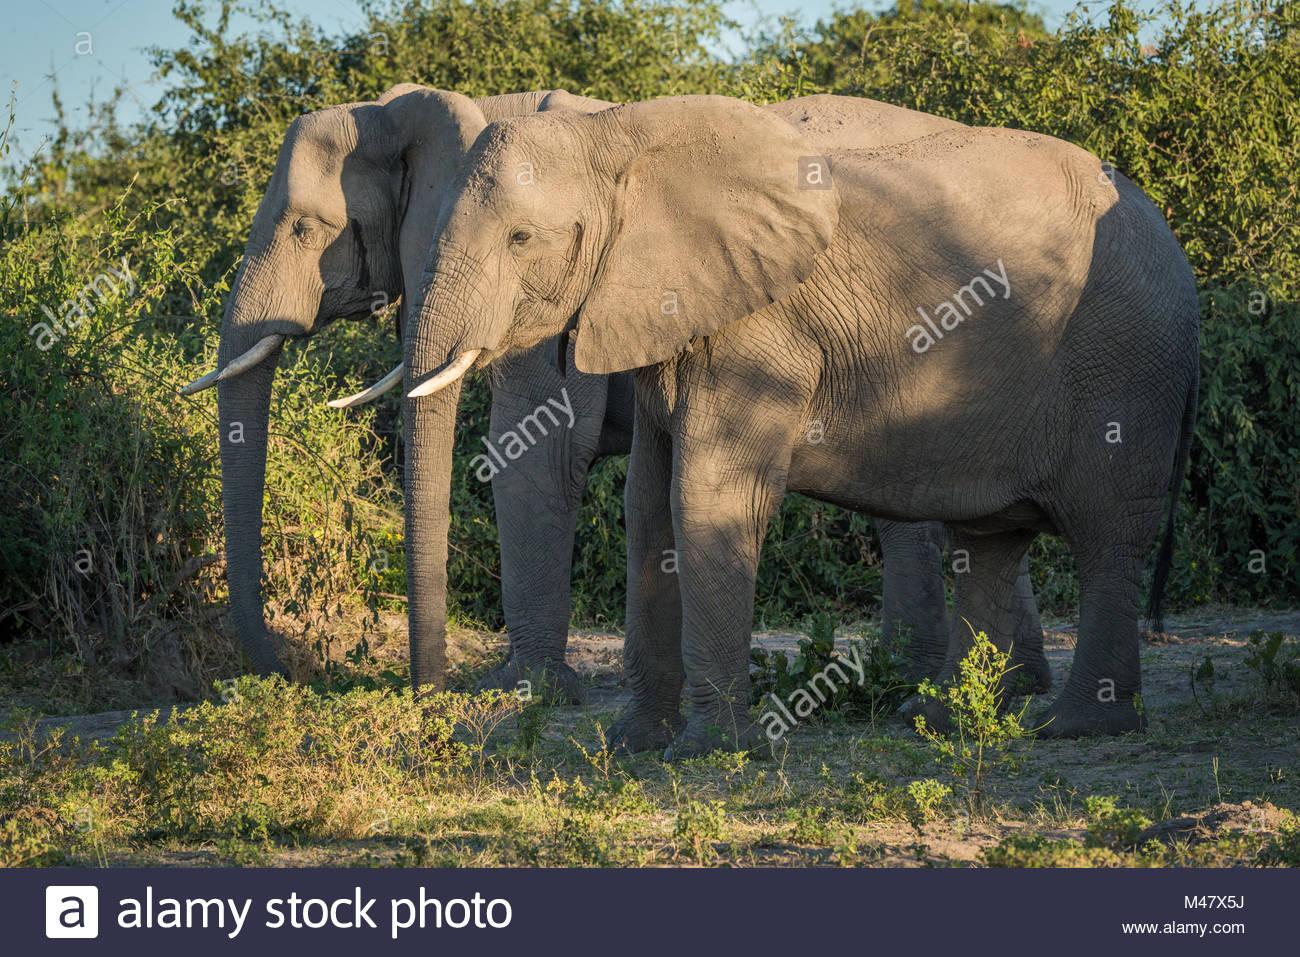 Two elephants standing side-by-side in dapple sunlight - Stock Image